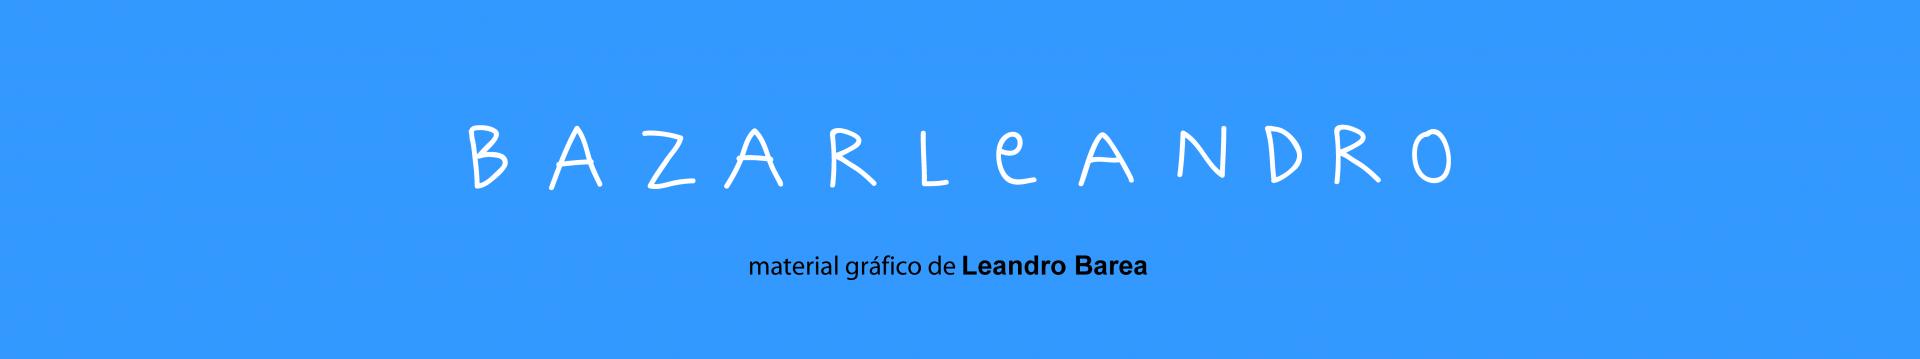 BazarLeandro